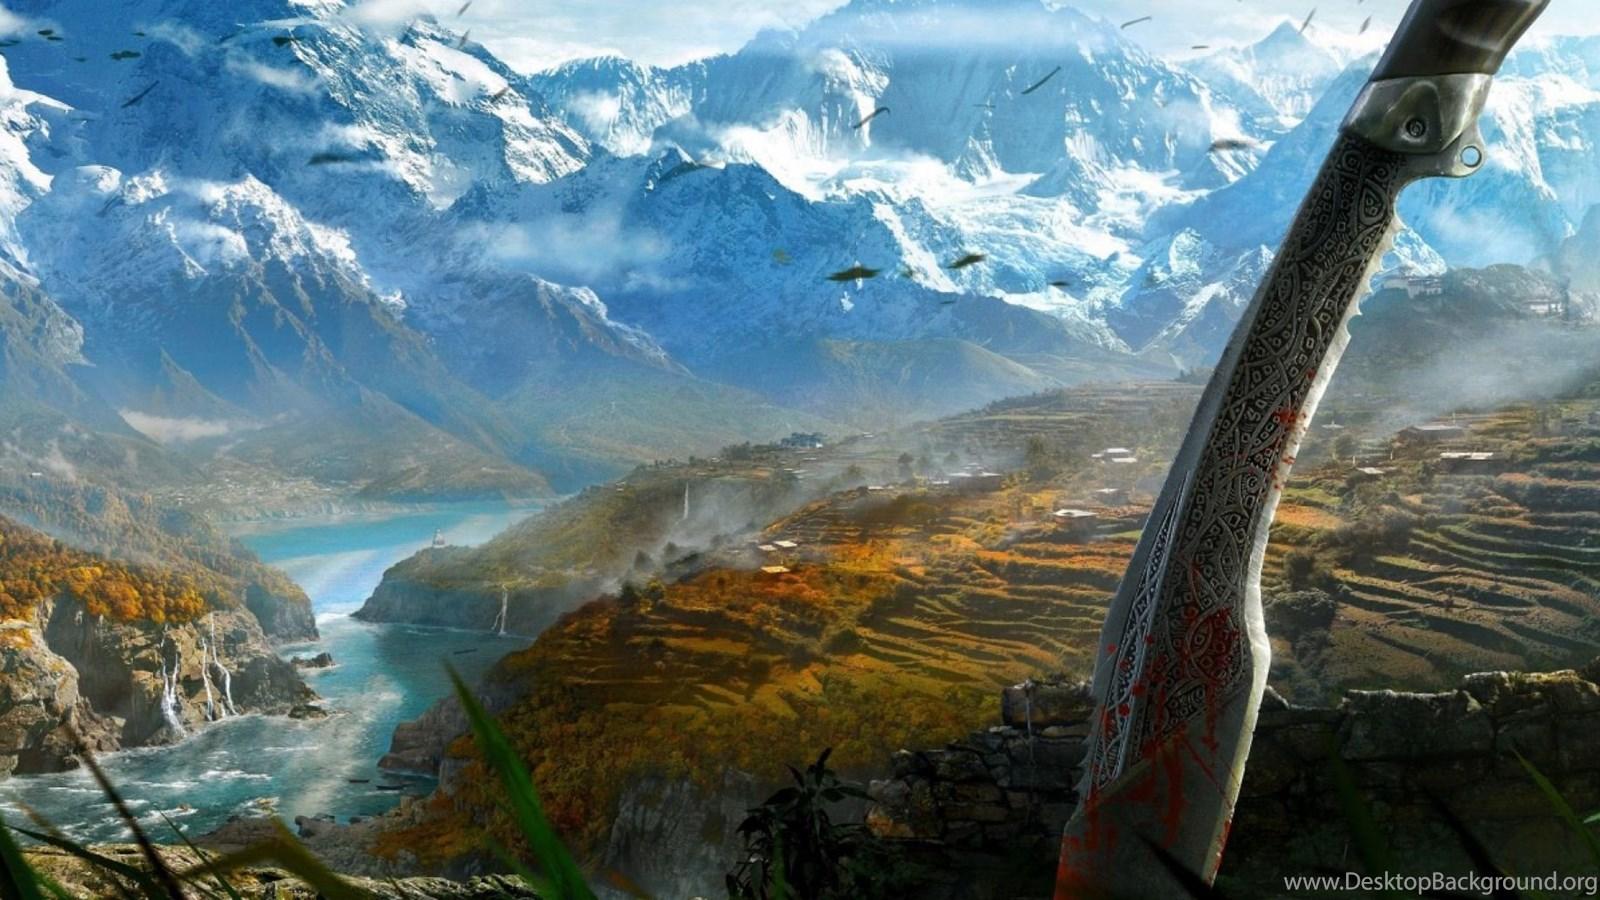 Far Cry 4 Wallpaper: Dual Monitor Resolution Far Cry 4 Wallpapers HD, Desktop